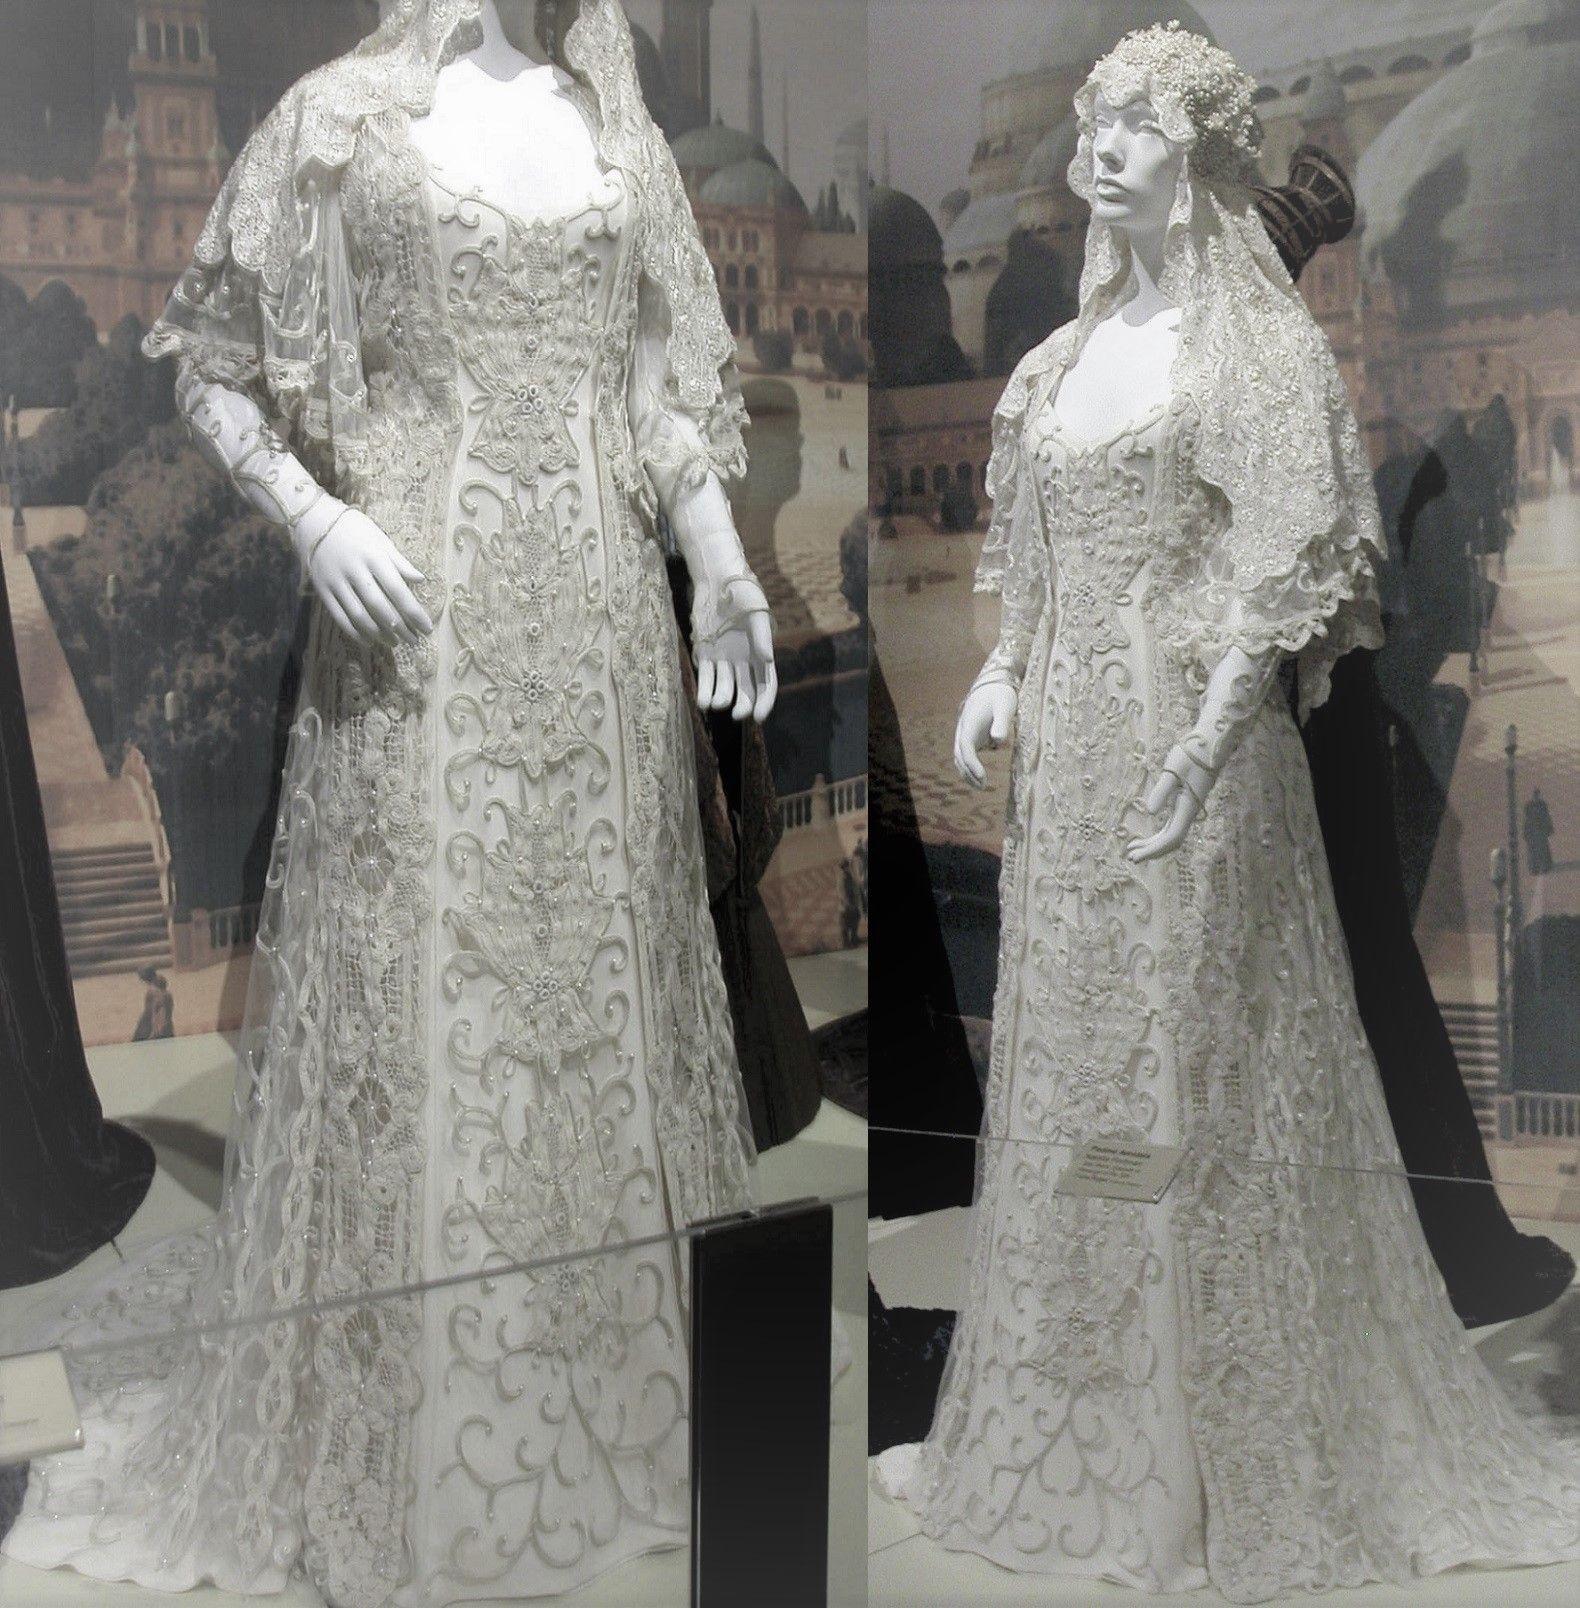 Padme Amidala S Wedding Dress Exhibit Star Wars Wedding Dress